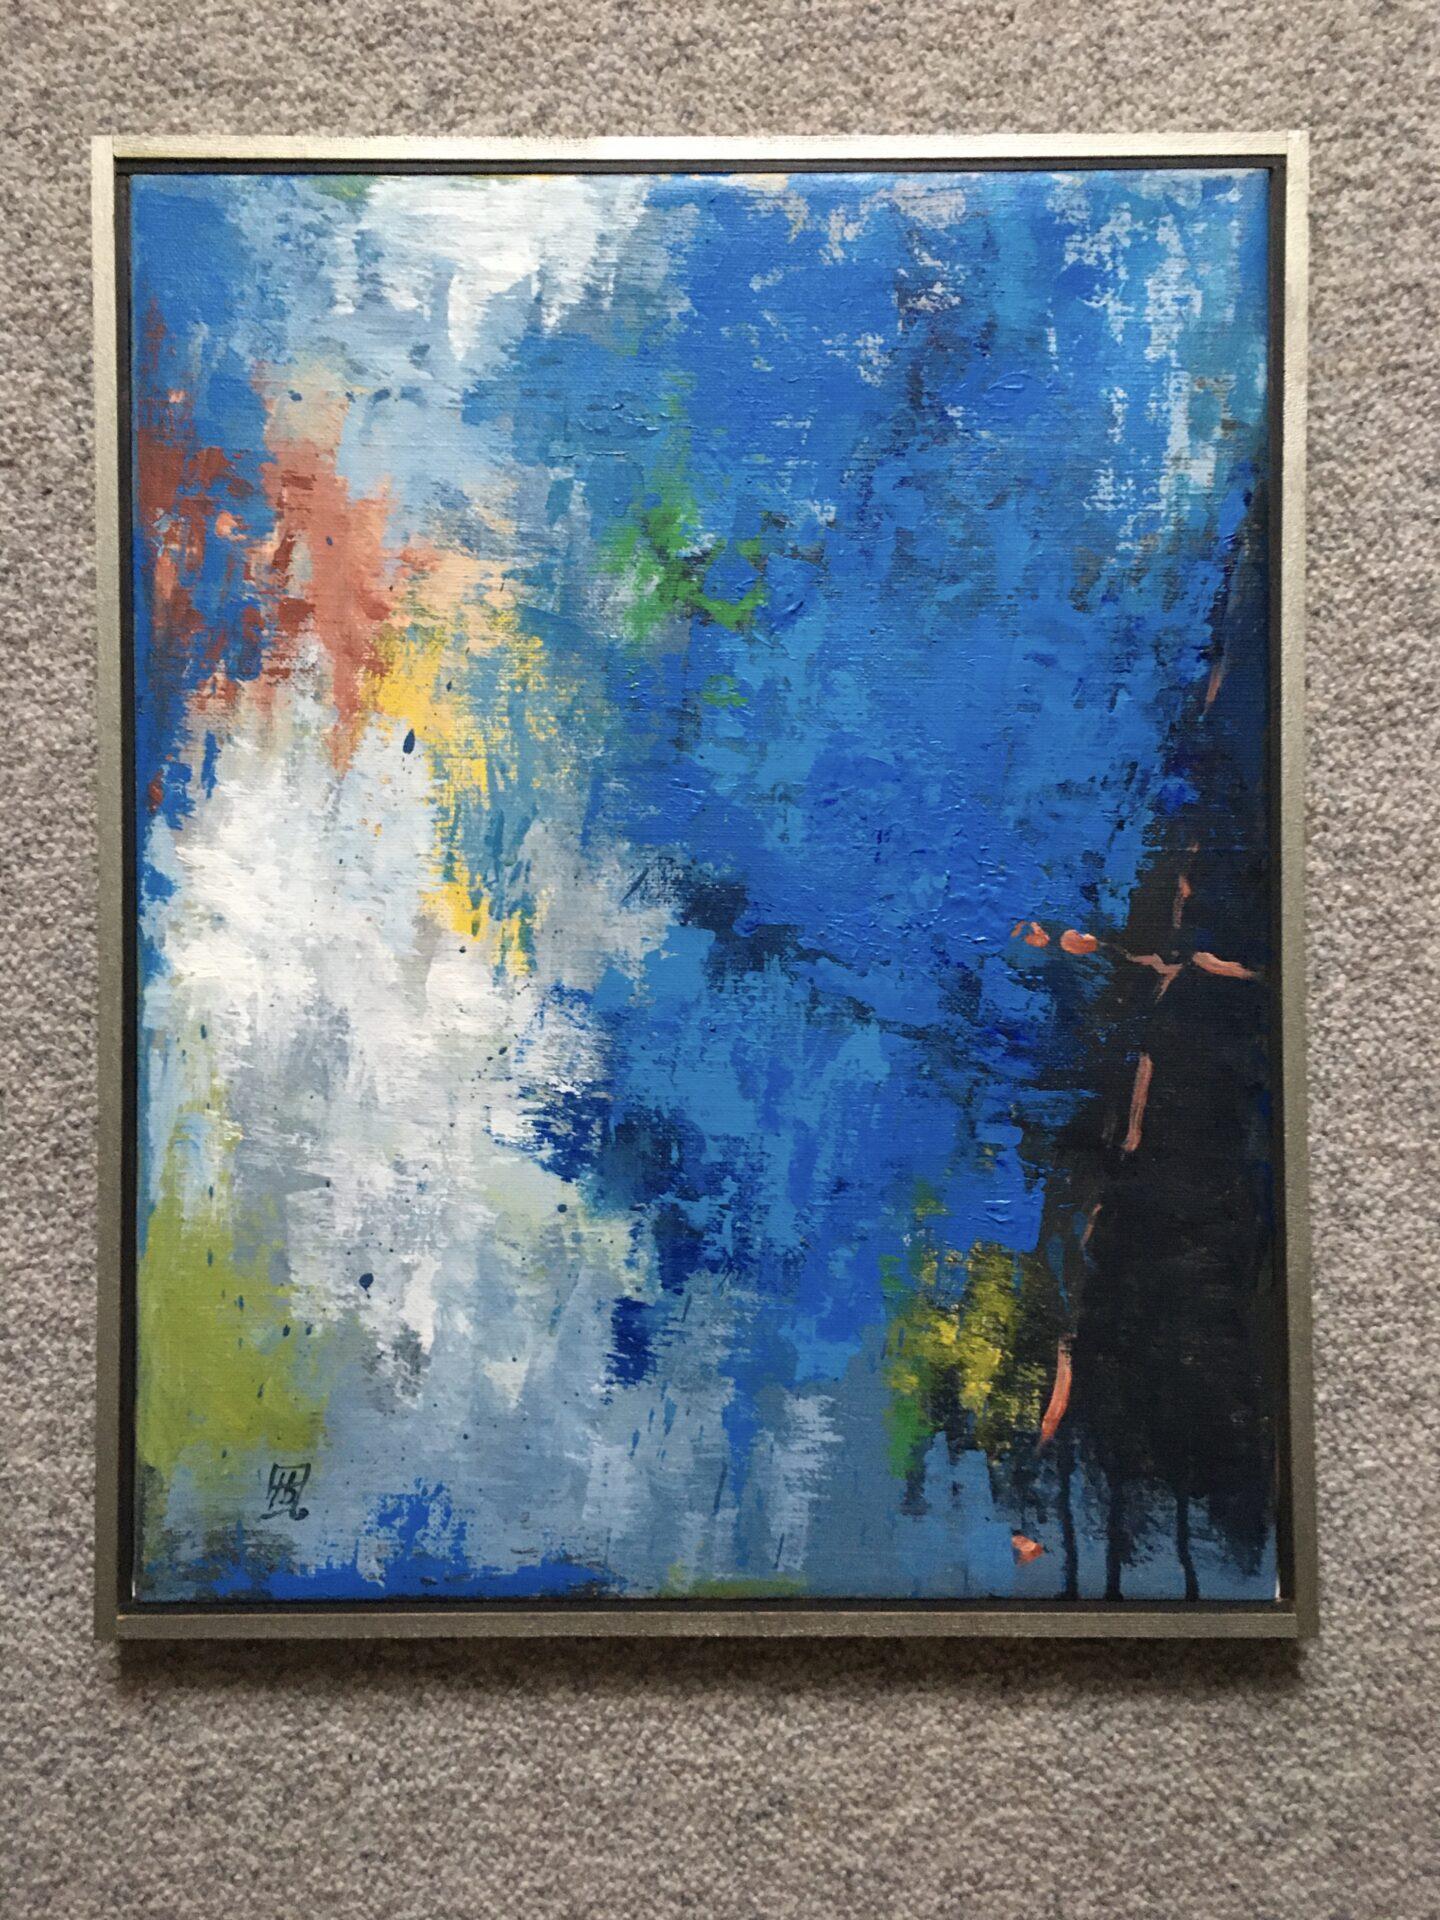 Maleri, sign Tony Buchardt, 95, rammemål 43x54 cm, pris 500 kr